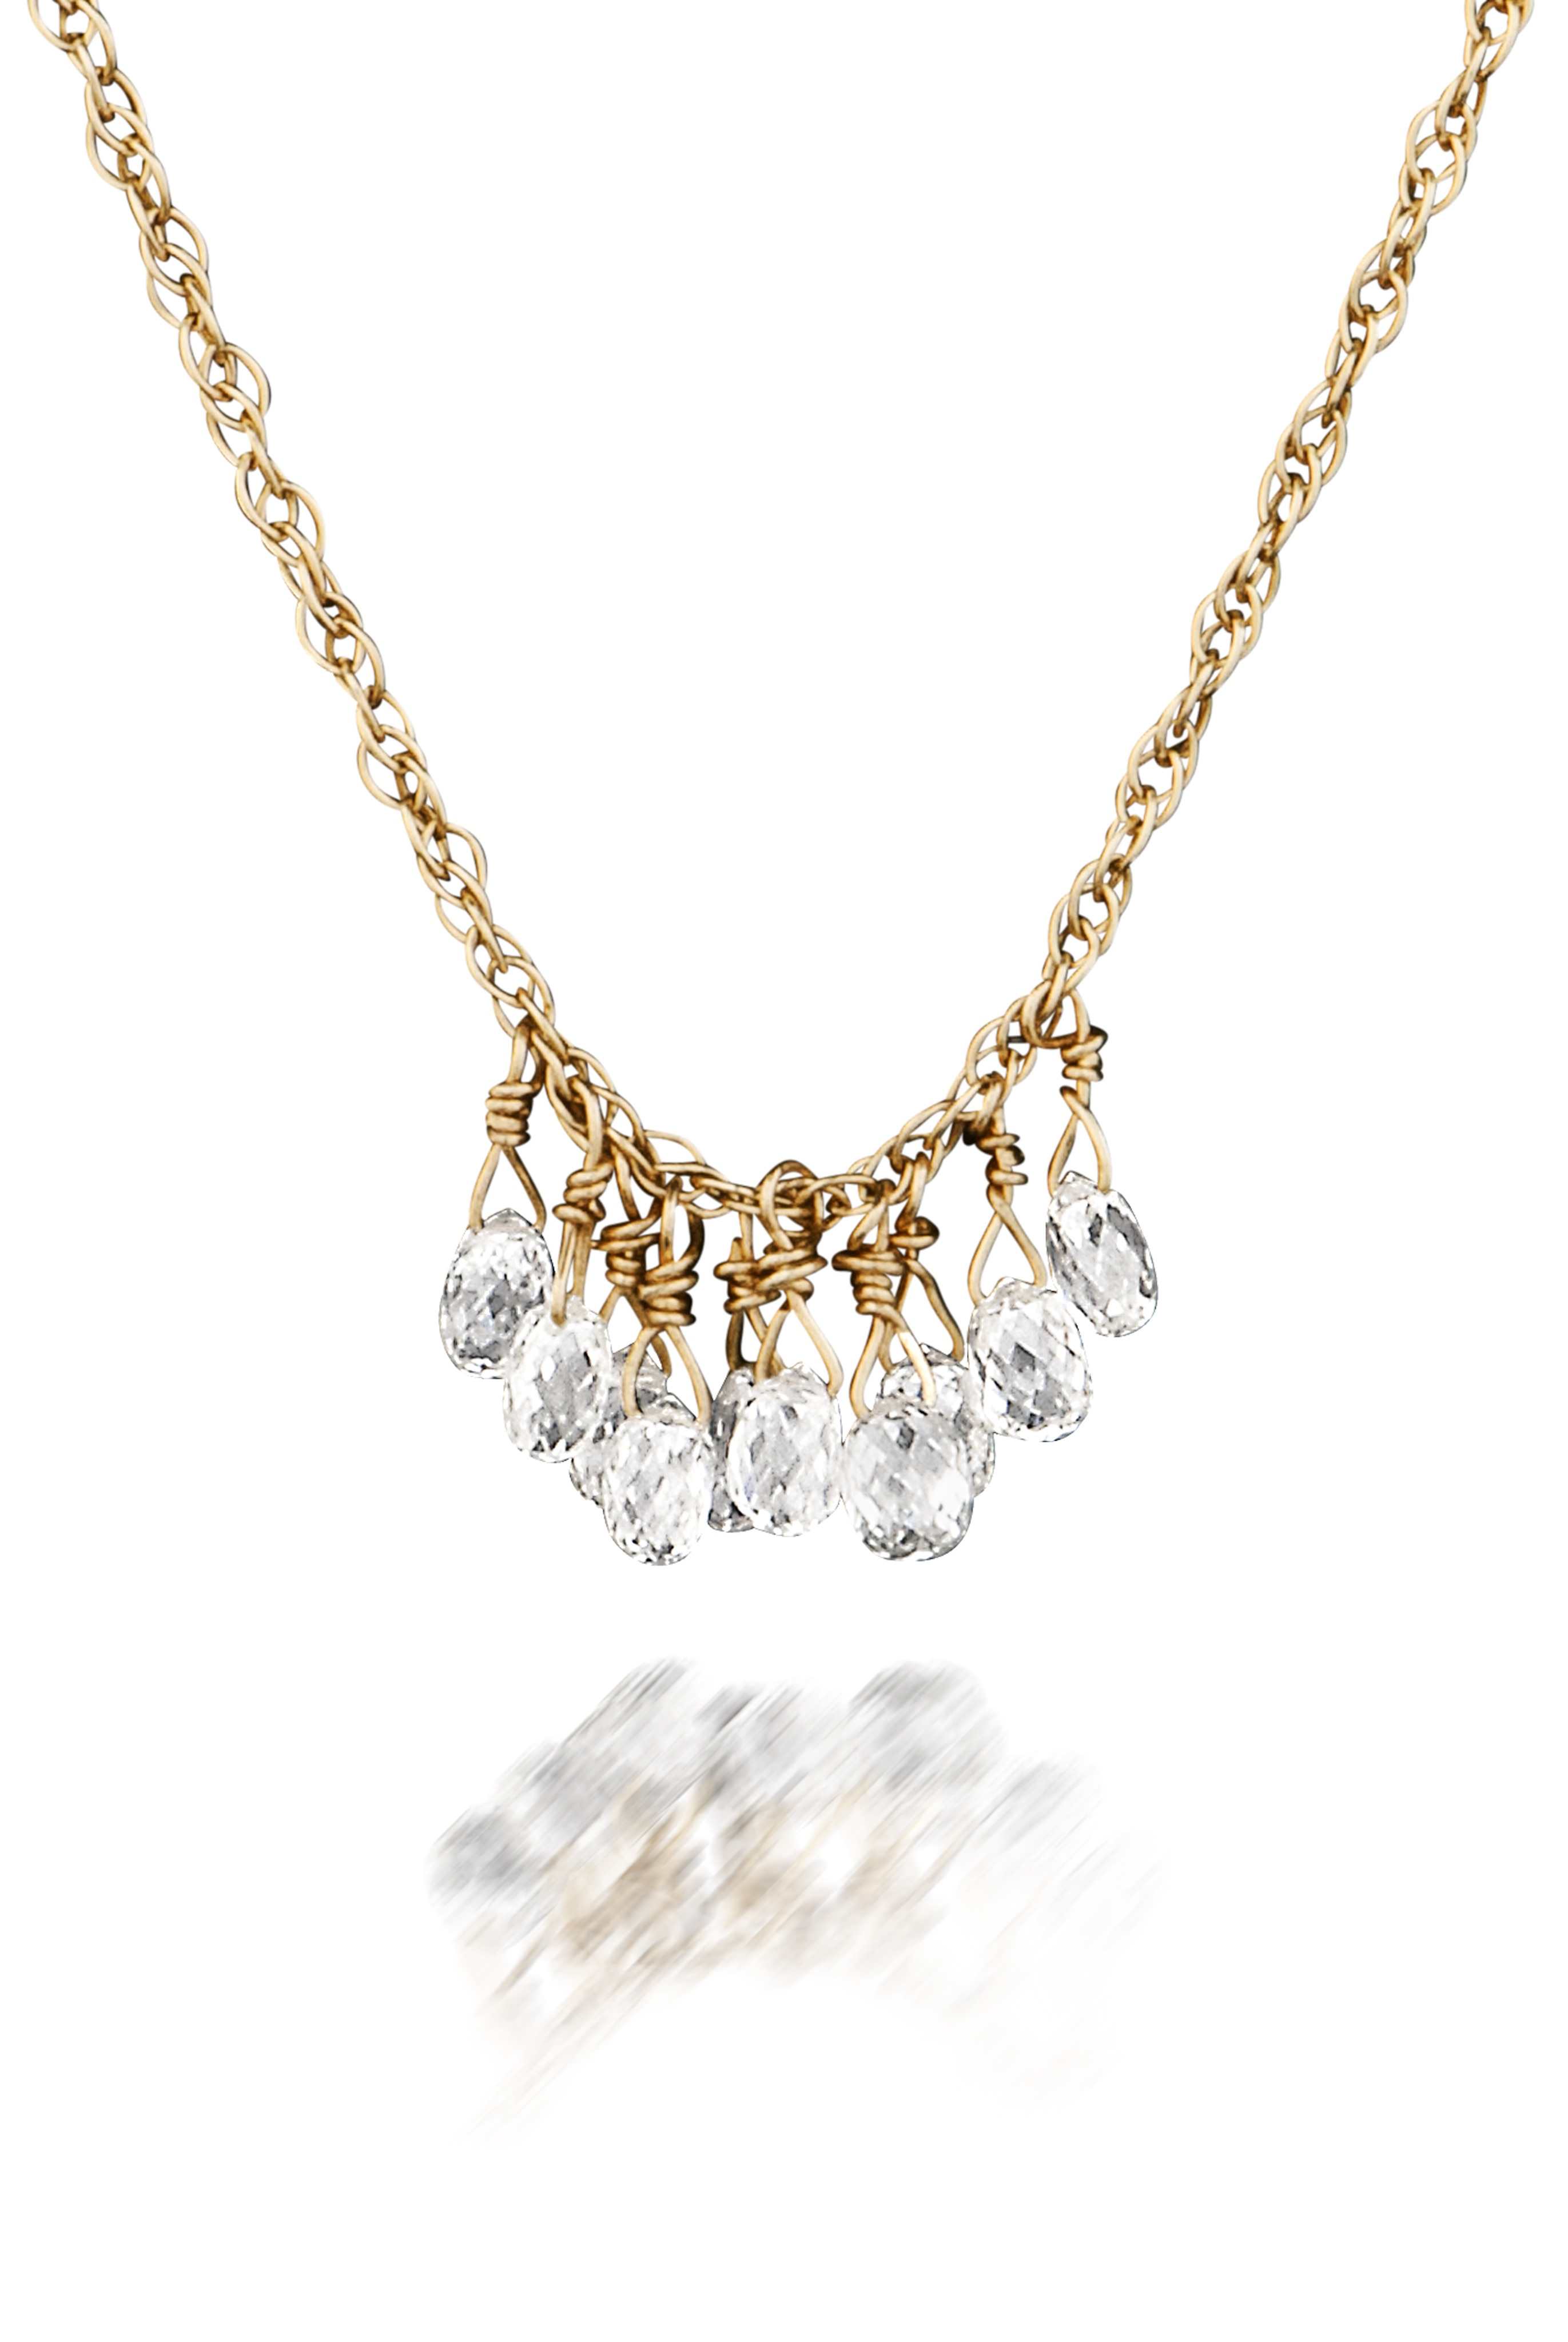 The Jewel - Just Jules - Lookbook - Gold Diamond Drop Necklace